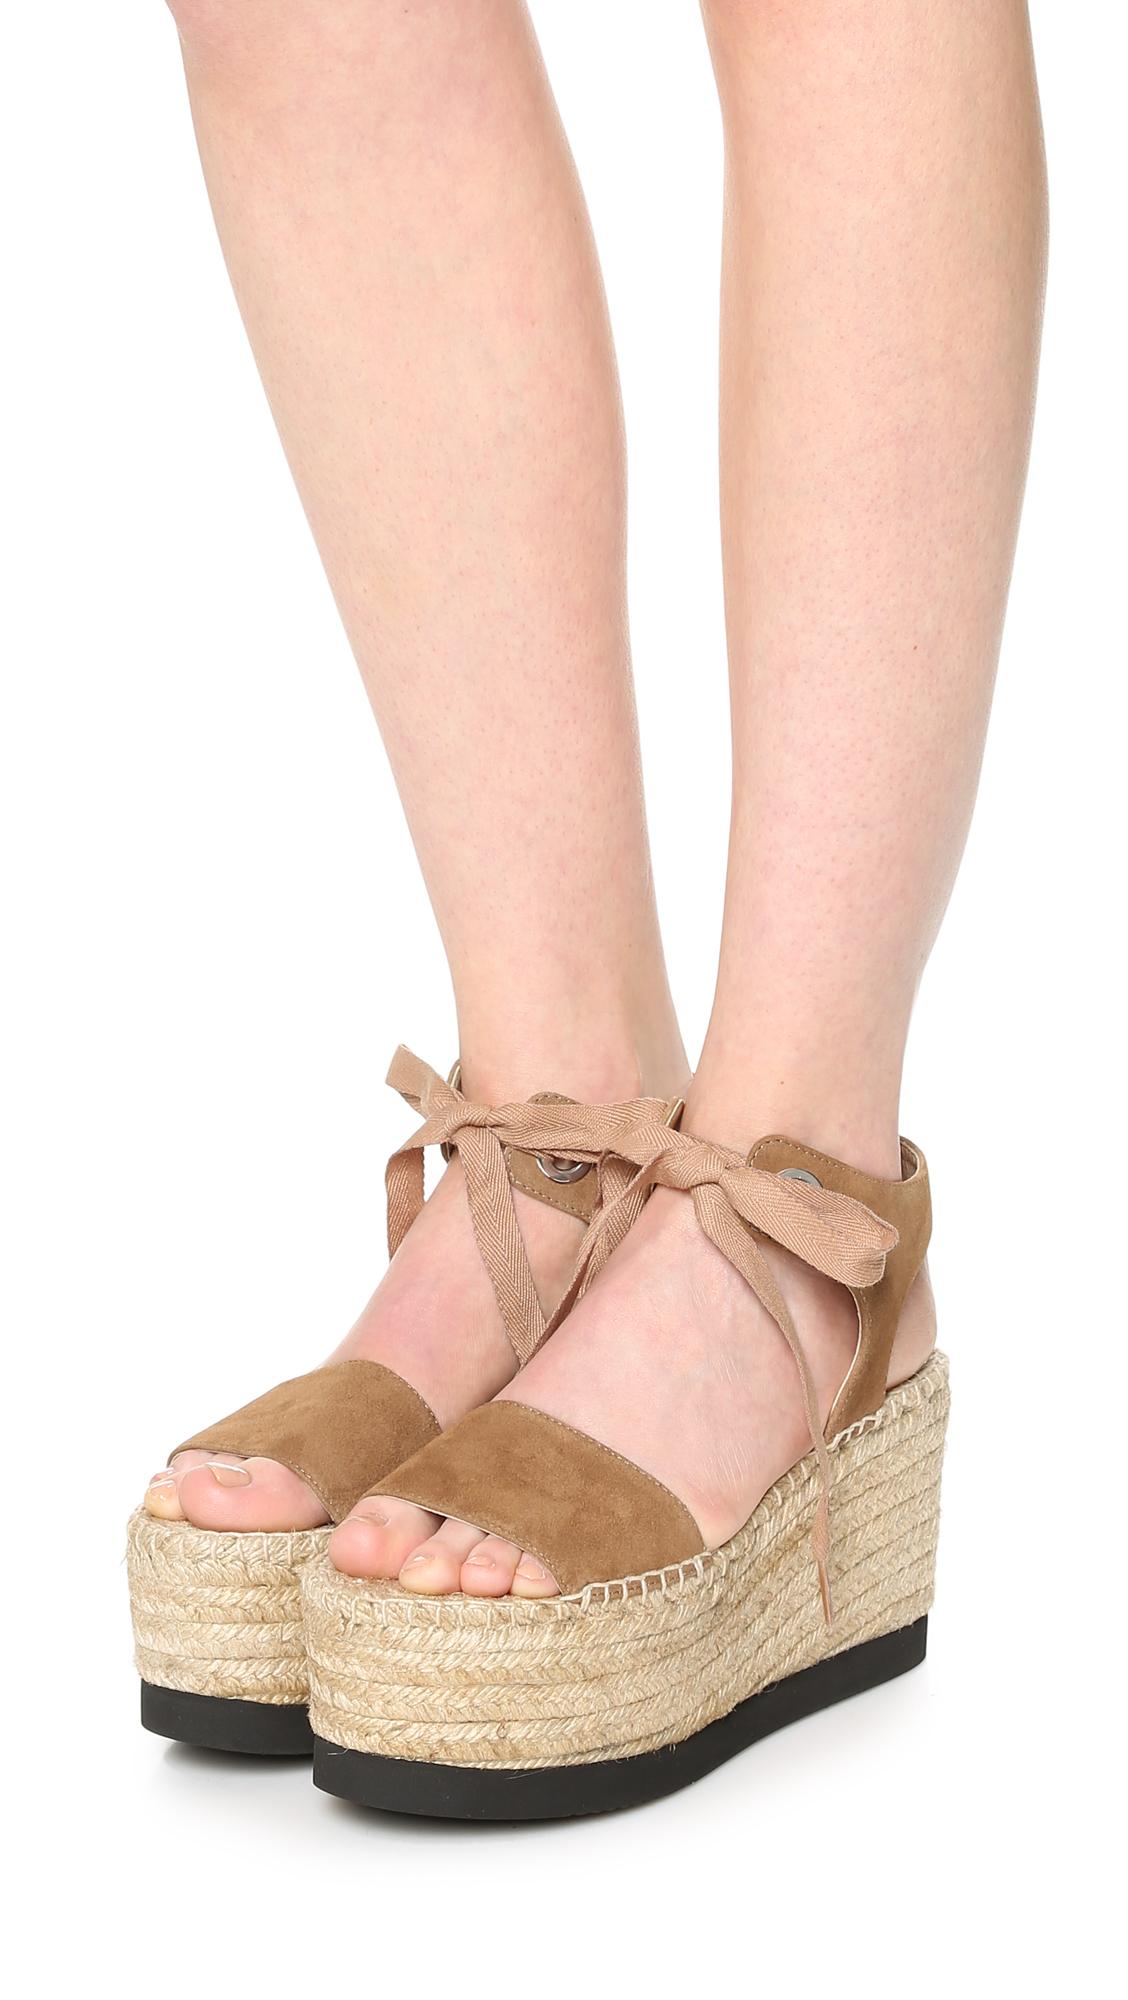 Chaussures - Espadrilles Paloma Barcel oWTXZm1J